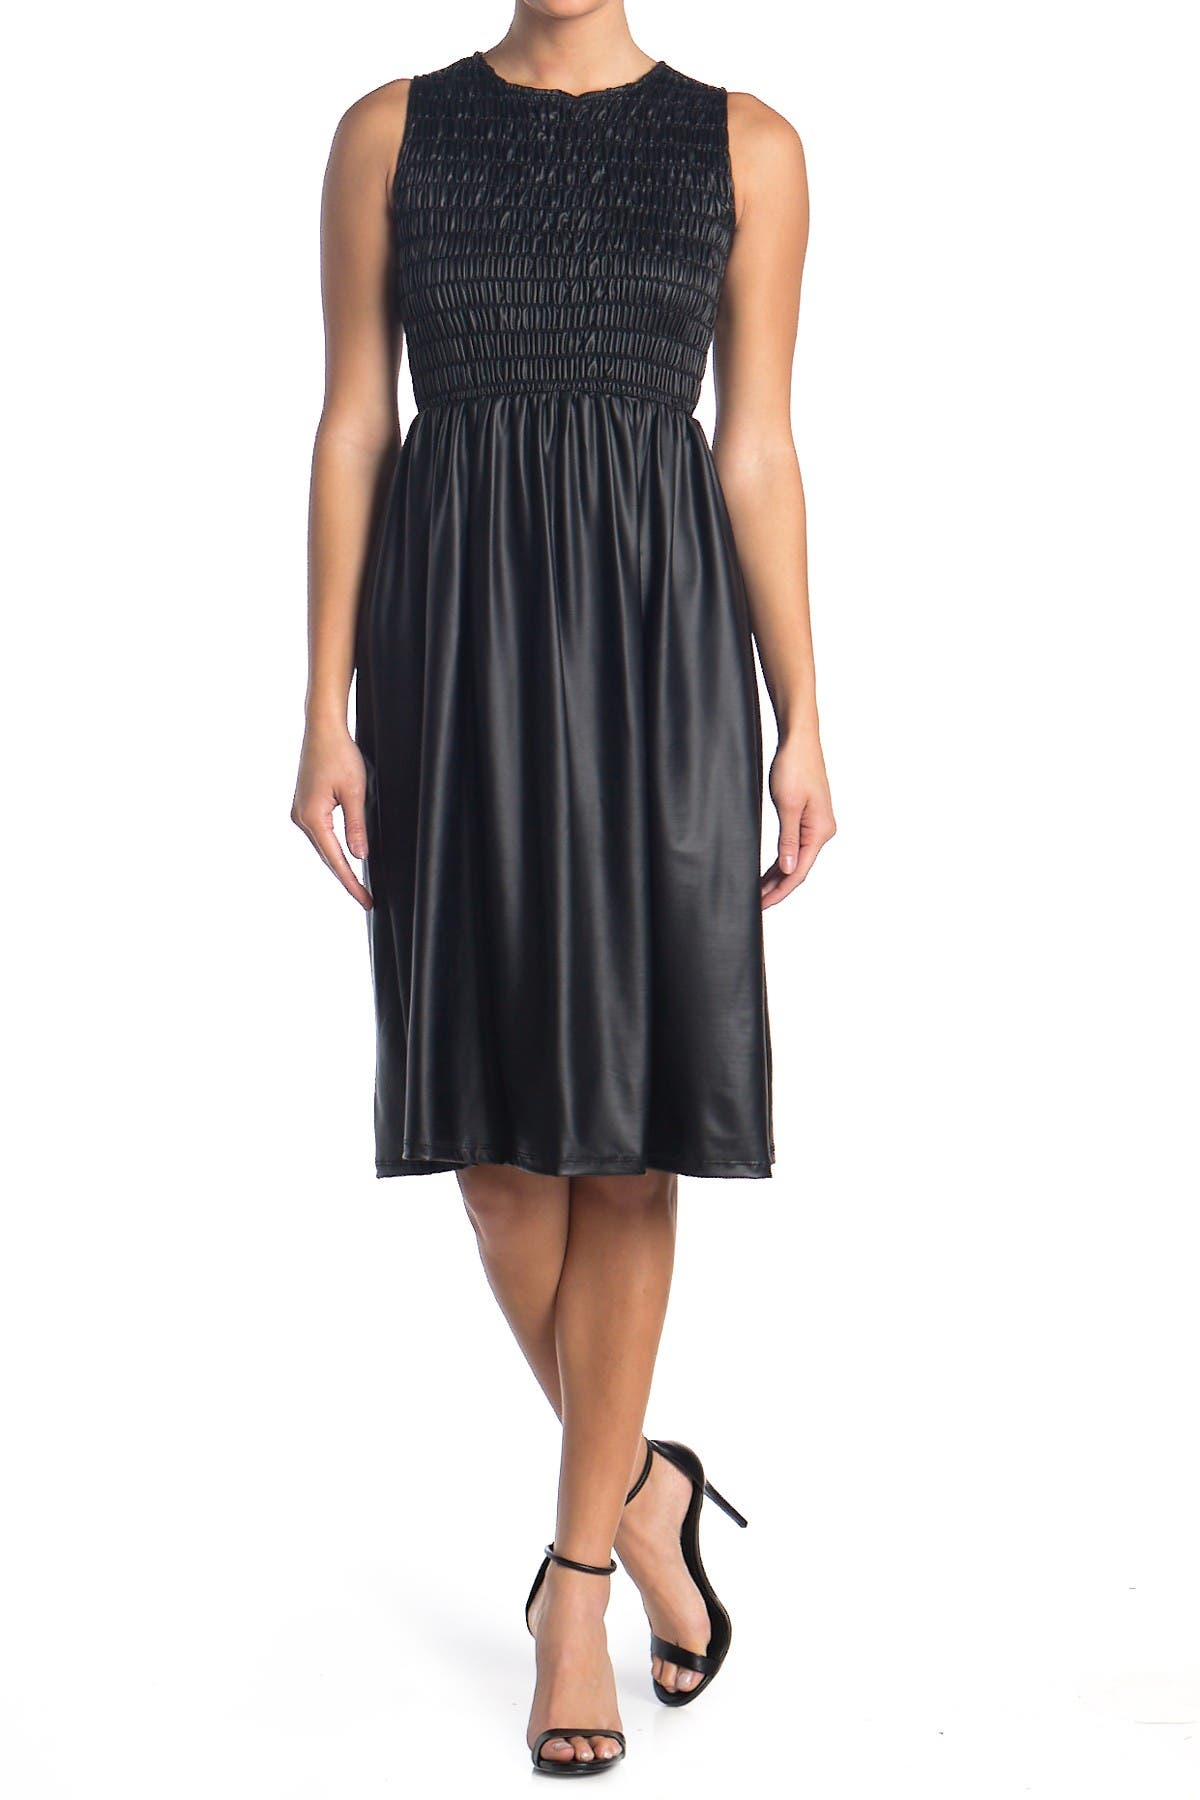 Image of Velvet Torch Smocked Faux Leather Midi Dress